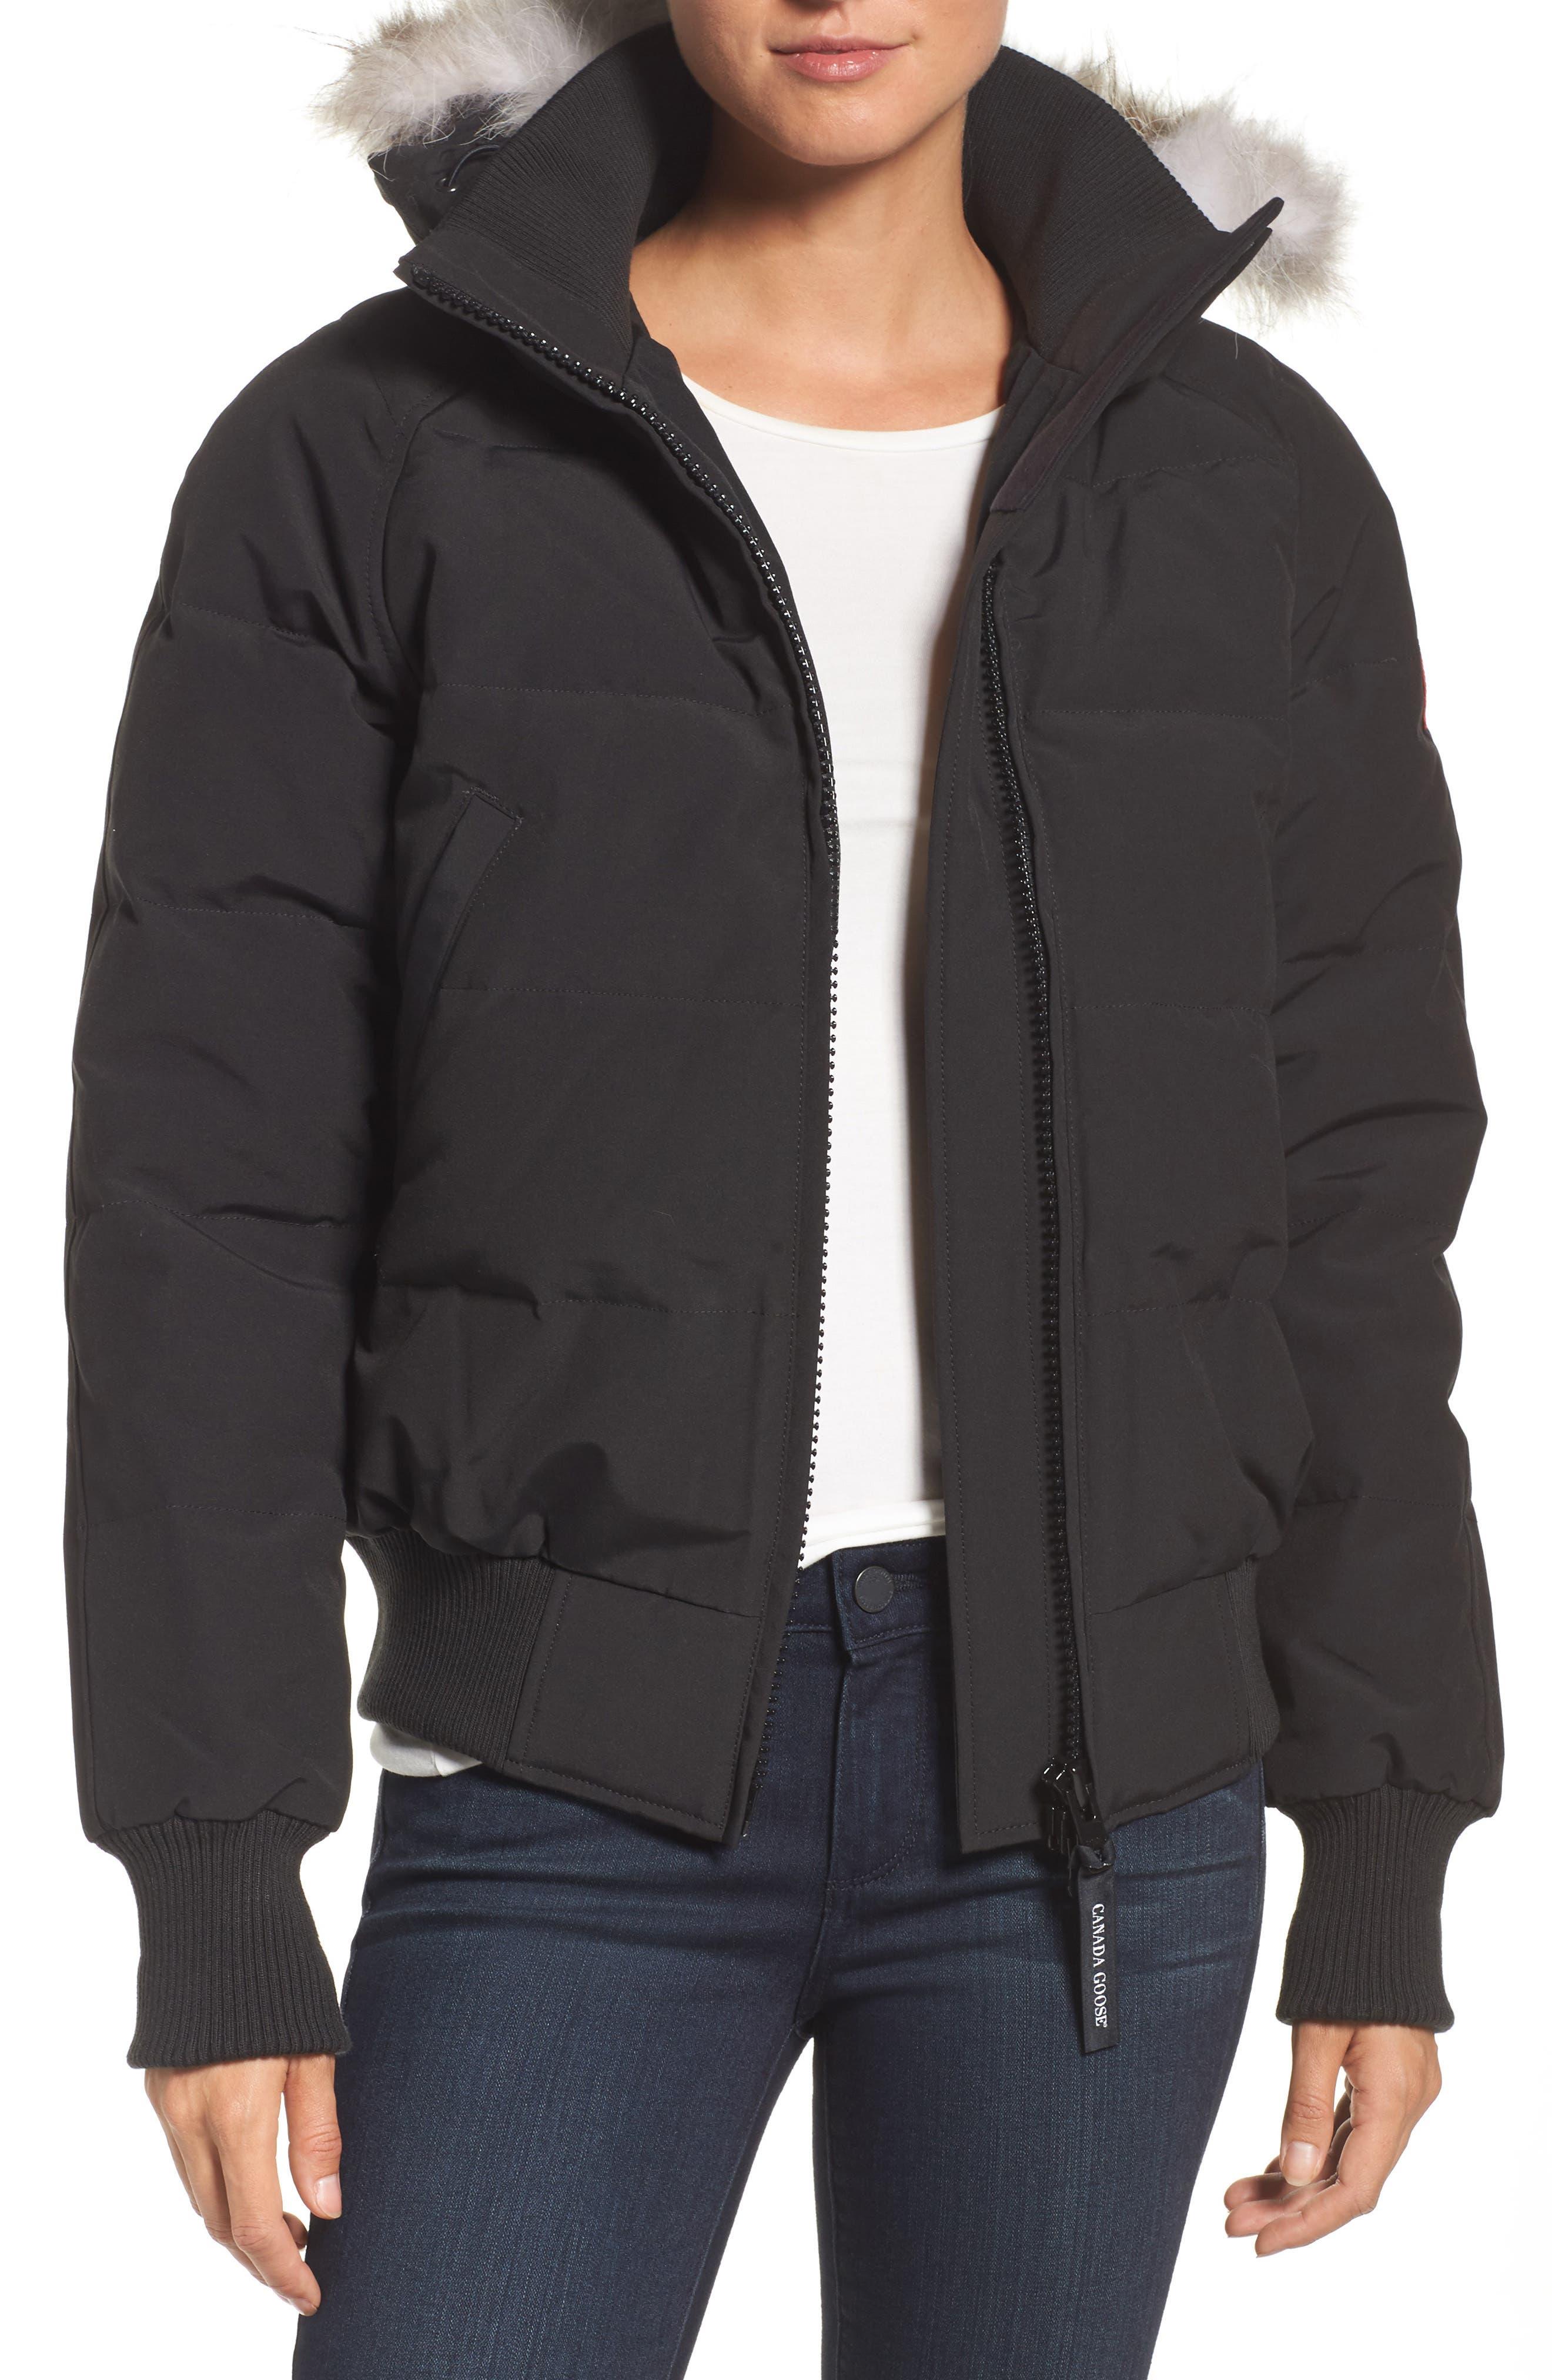 'Savona' Bomber Jacket with Genuine Coyote Fur Trim,                             Main thumbnail 1, color,                             Black